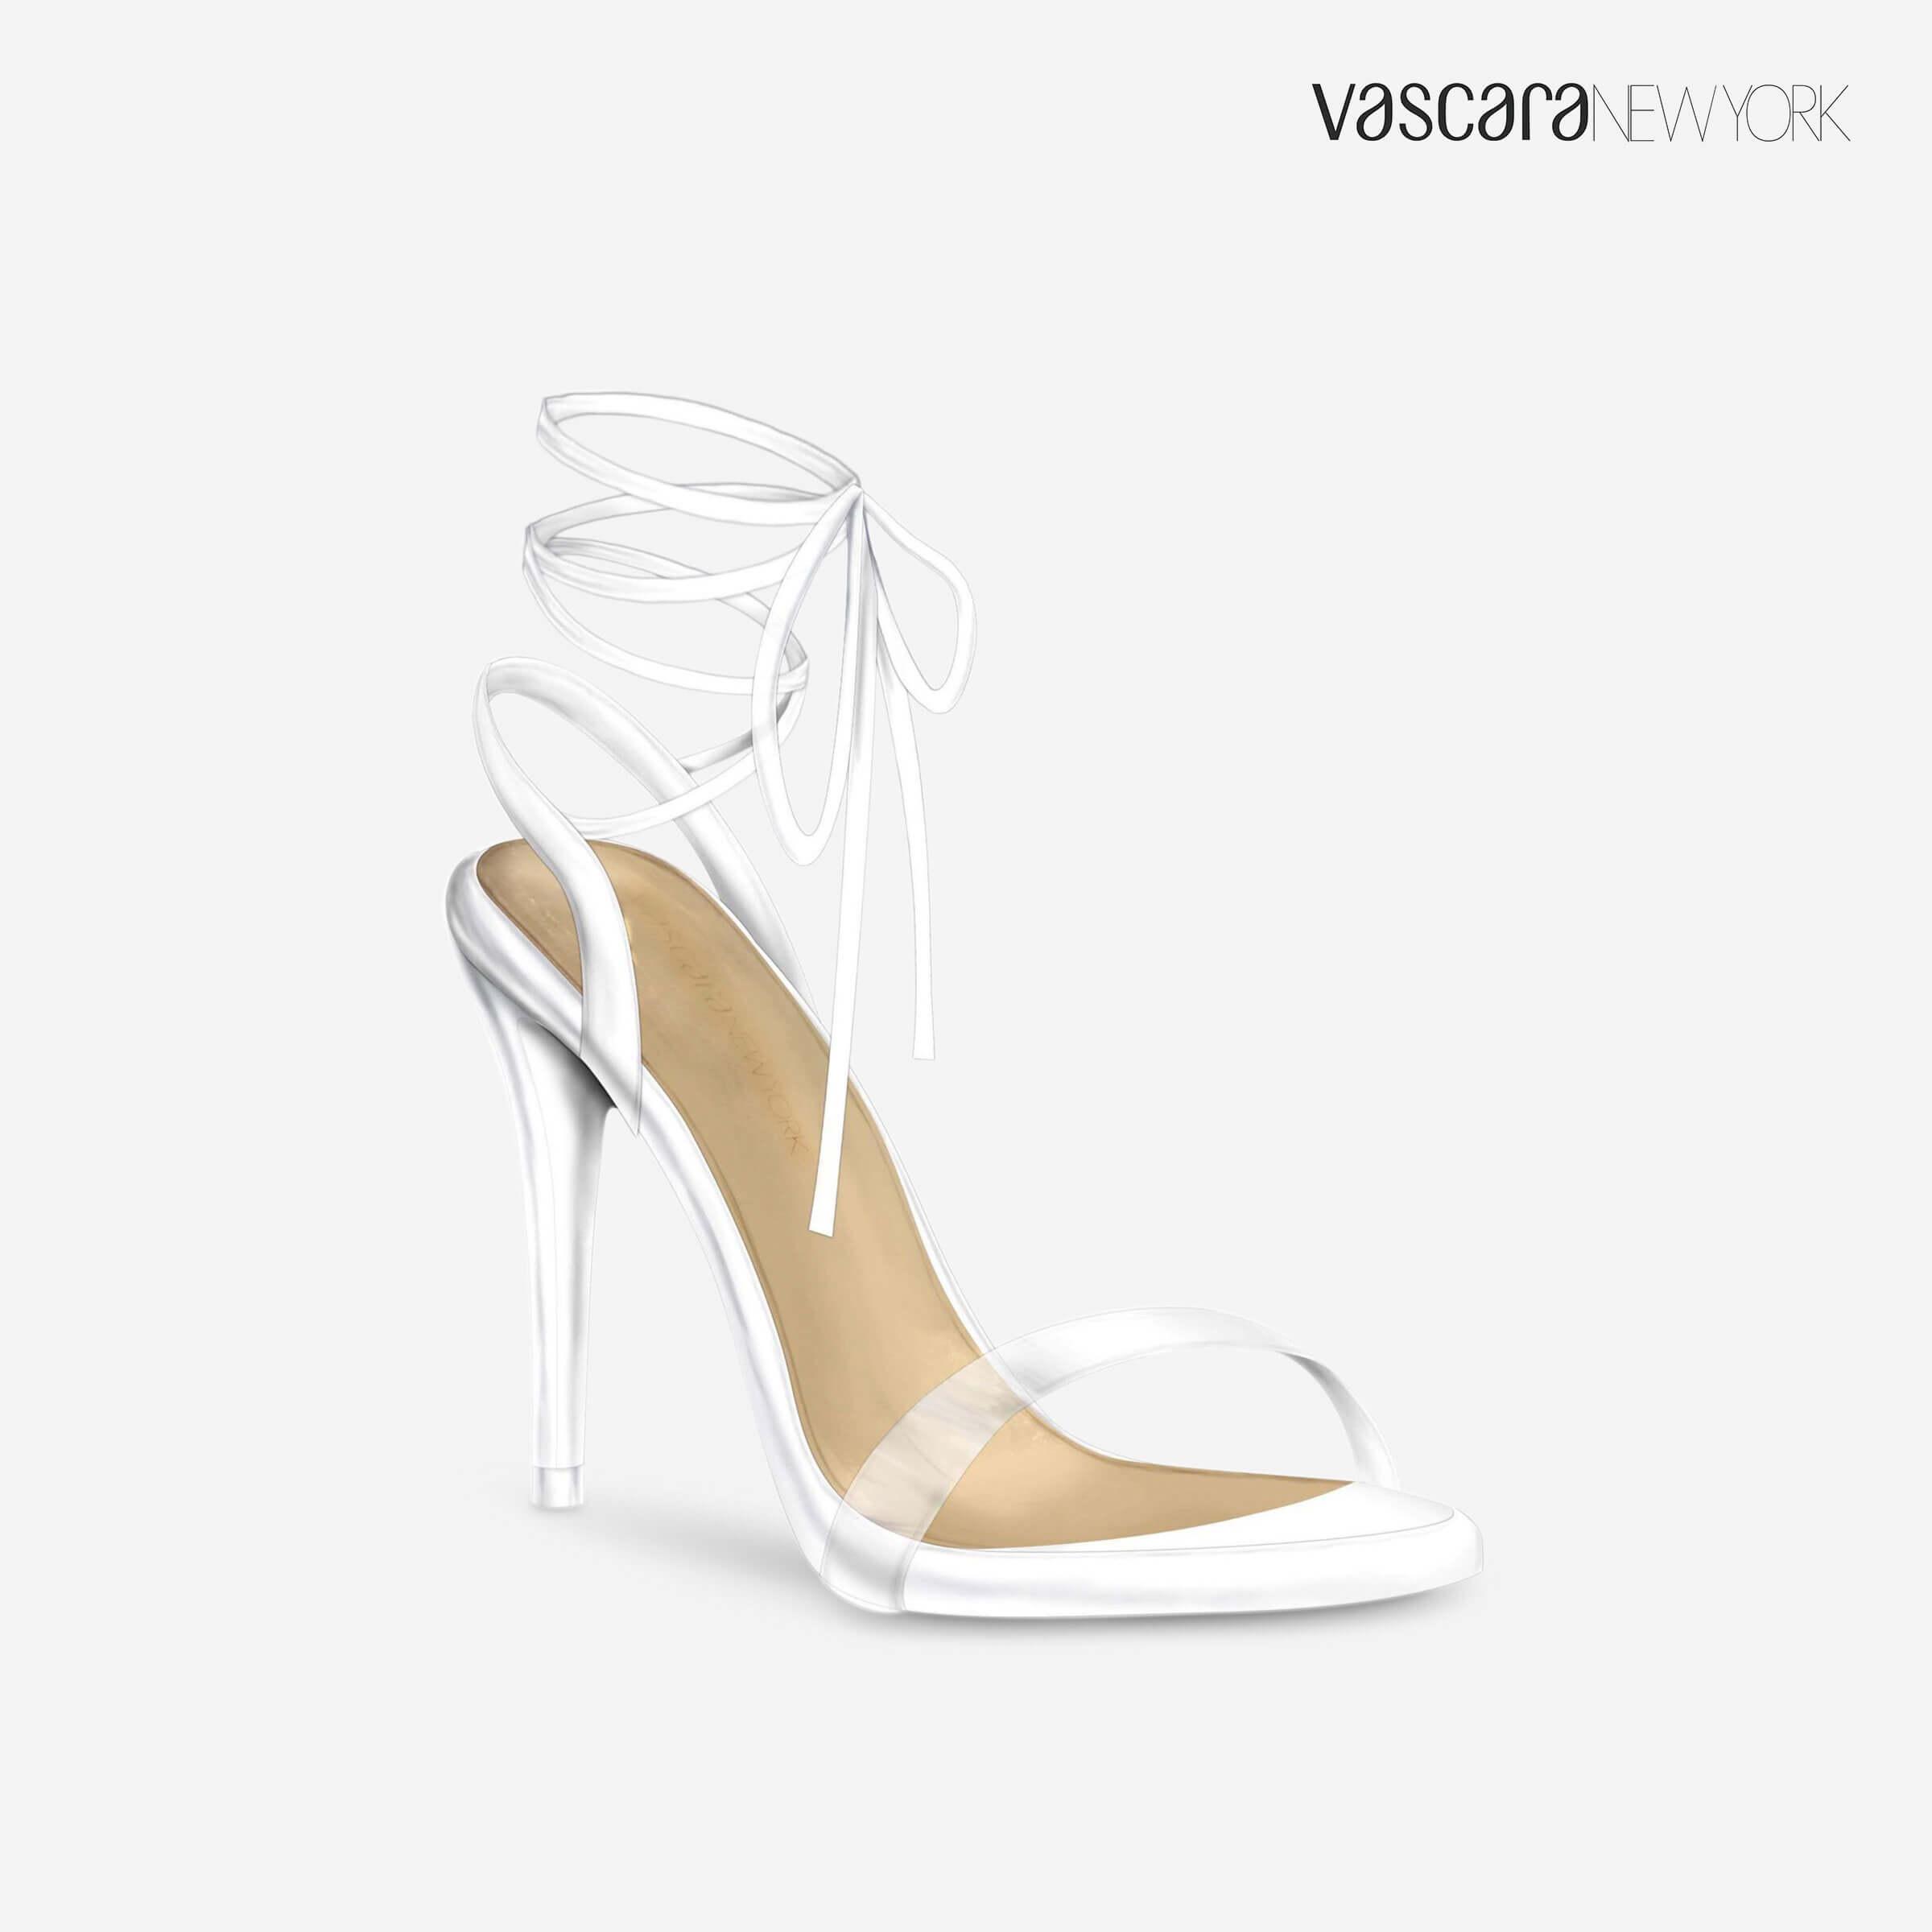 giày cao gót thắt nơ vascara